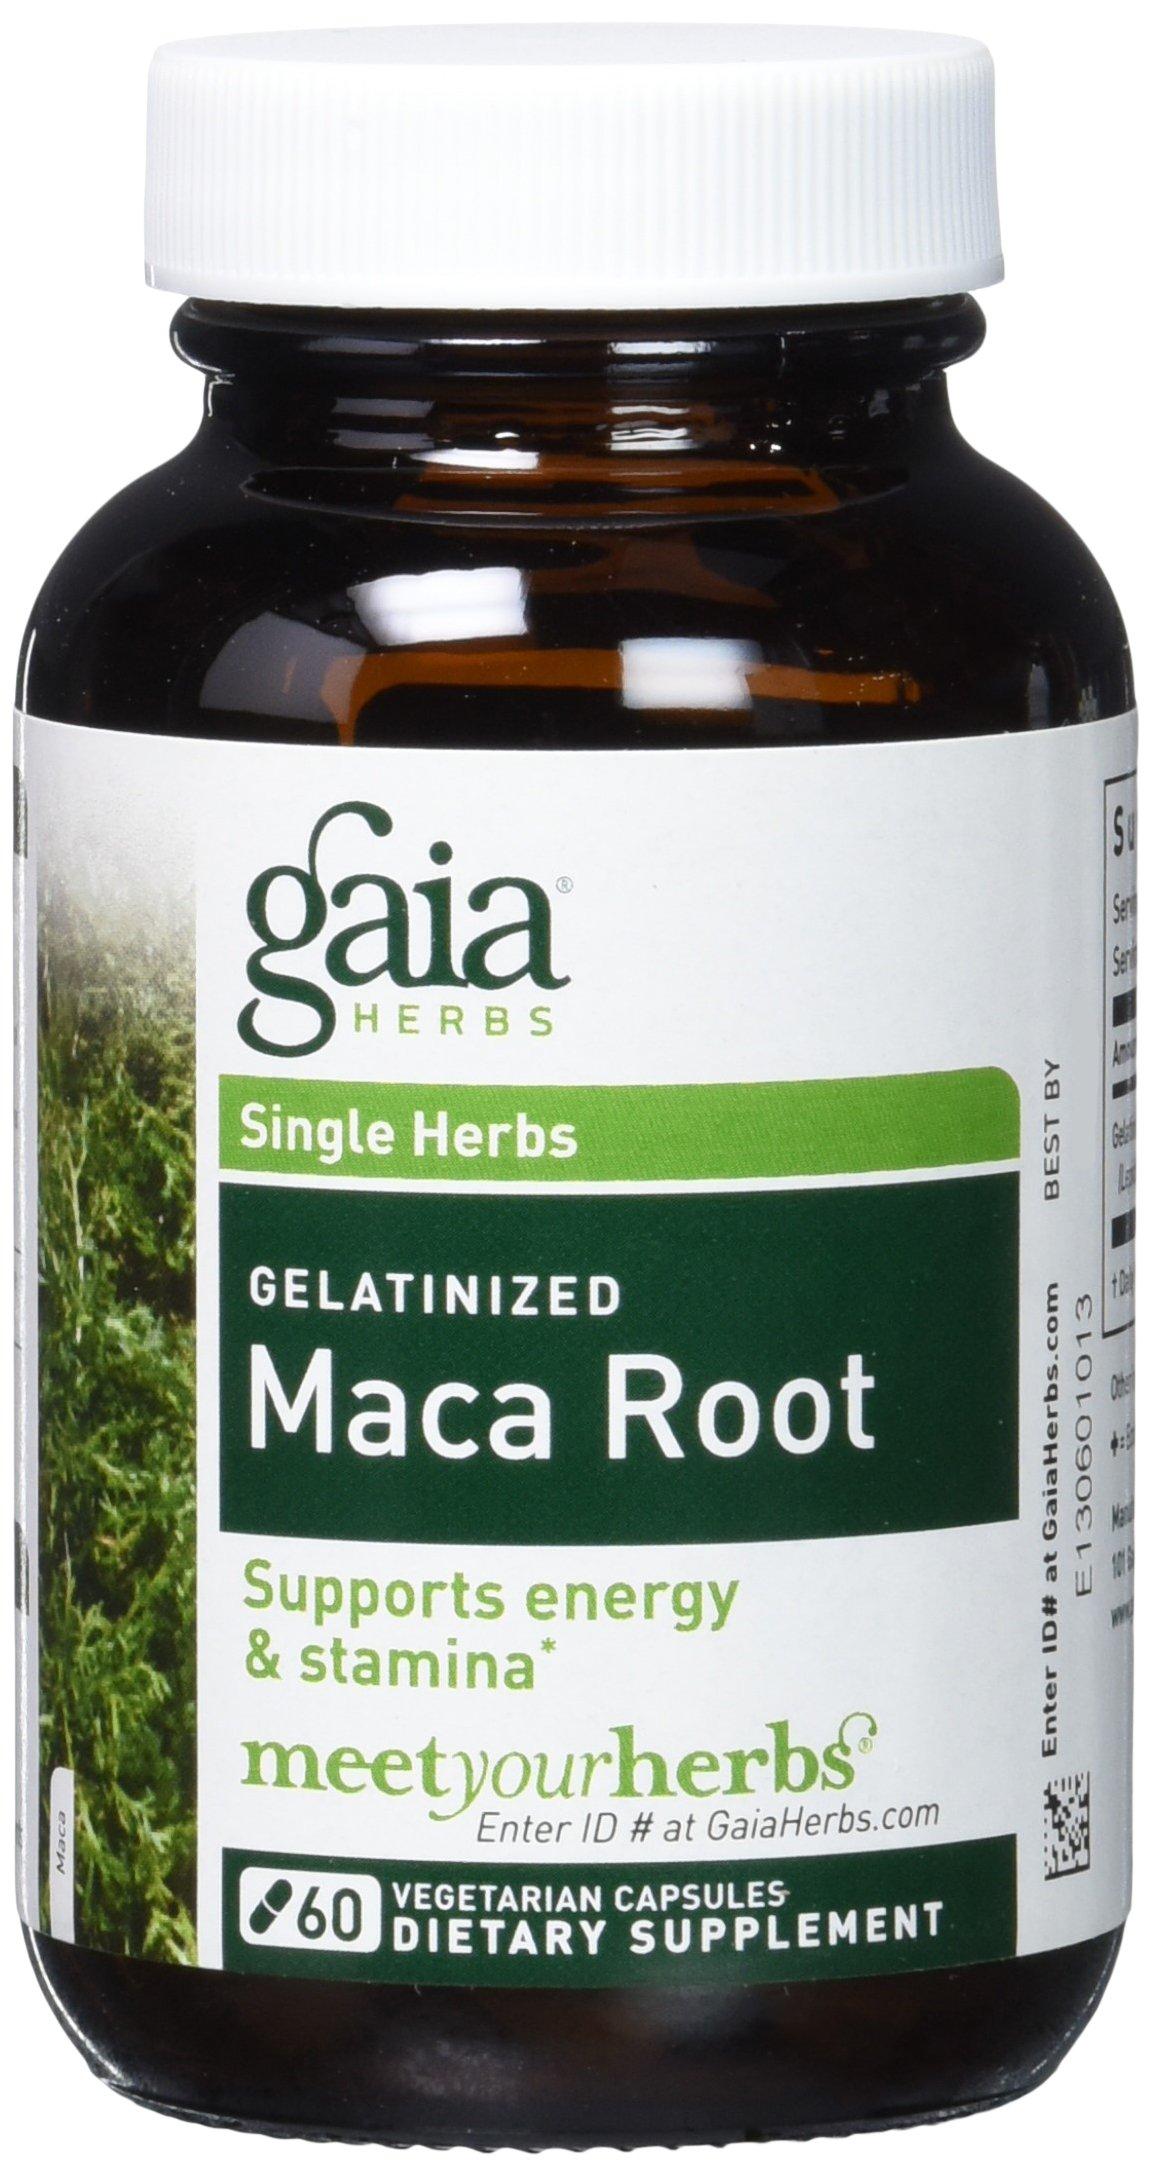 Gaia Herbs Maca Root Capsules, 60 count